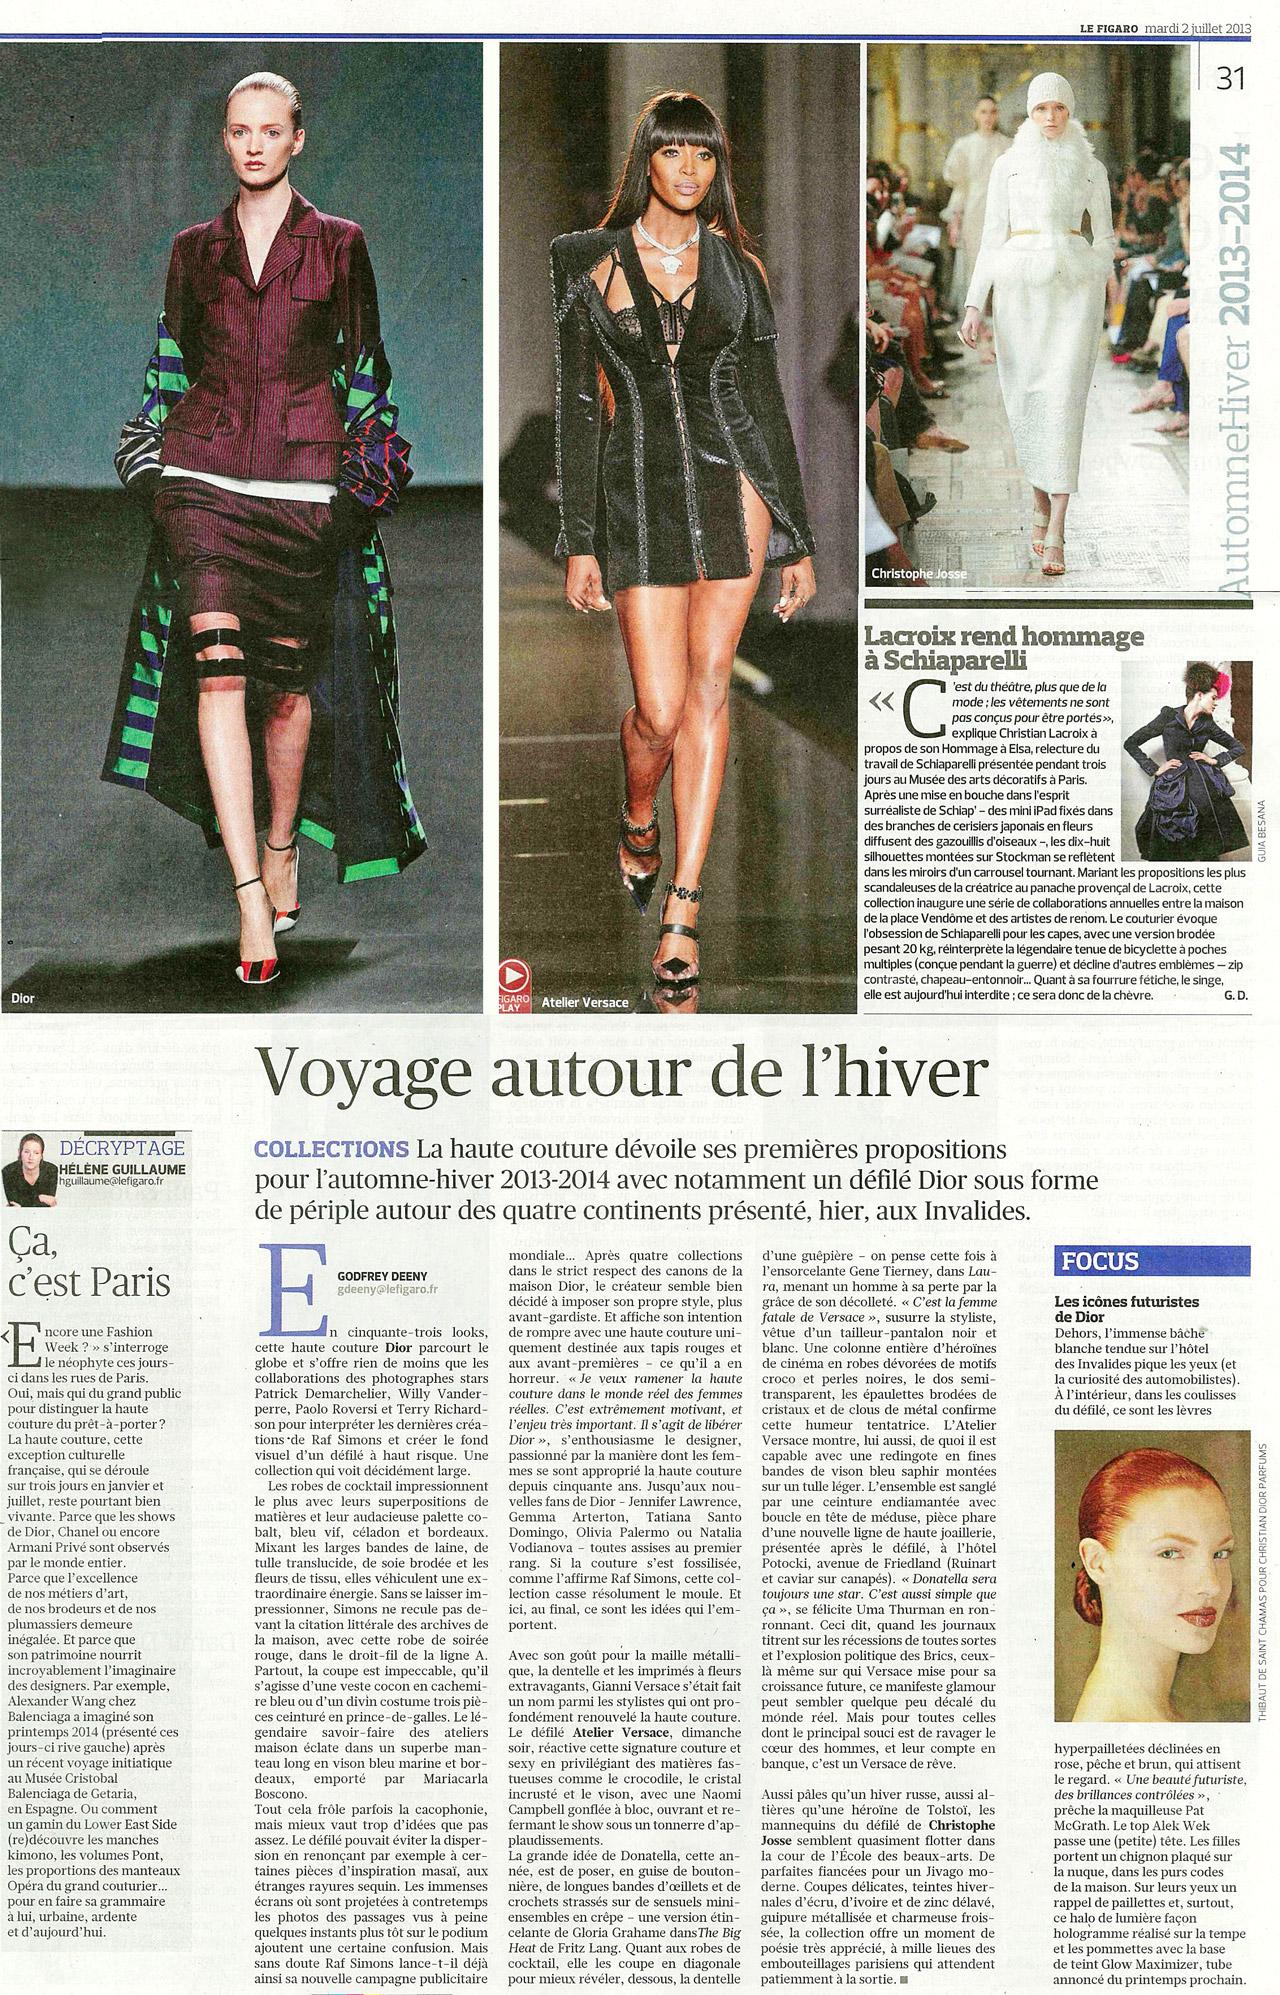 (Français) Le Figaro